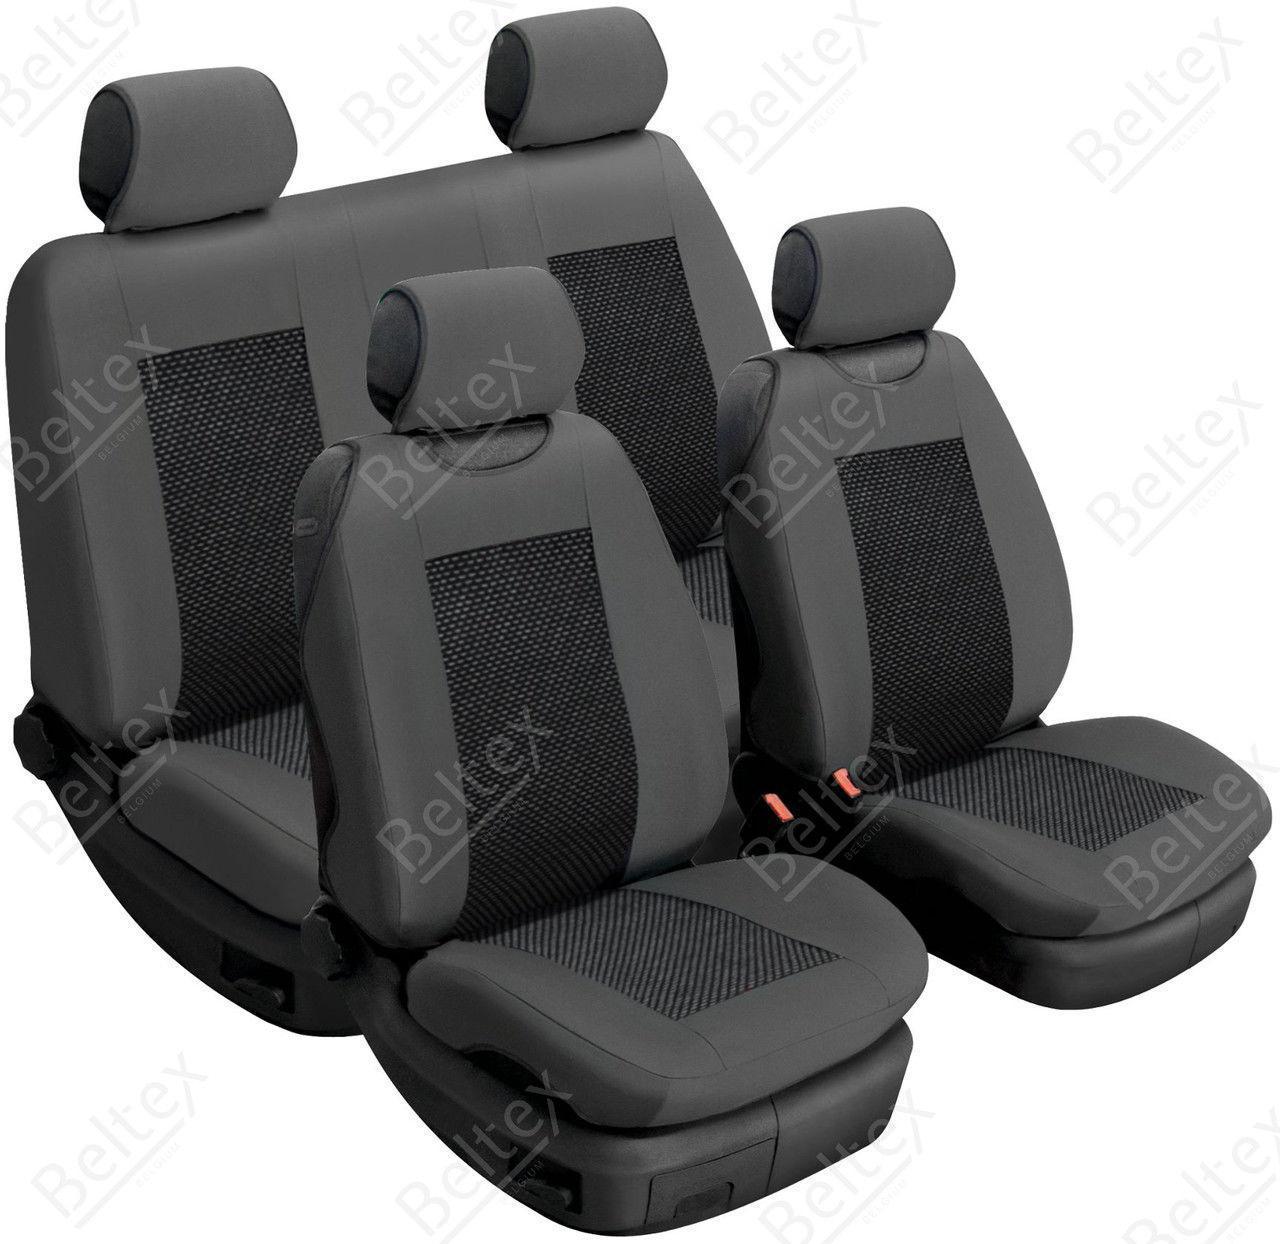 Майки/чехлы на сиденья Форд Скорпио (Ford Scorpio)